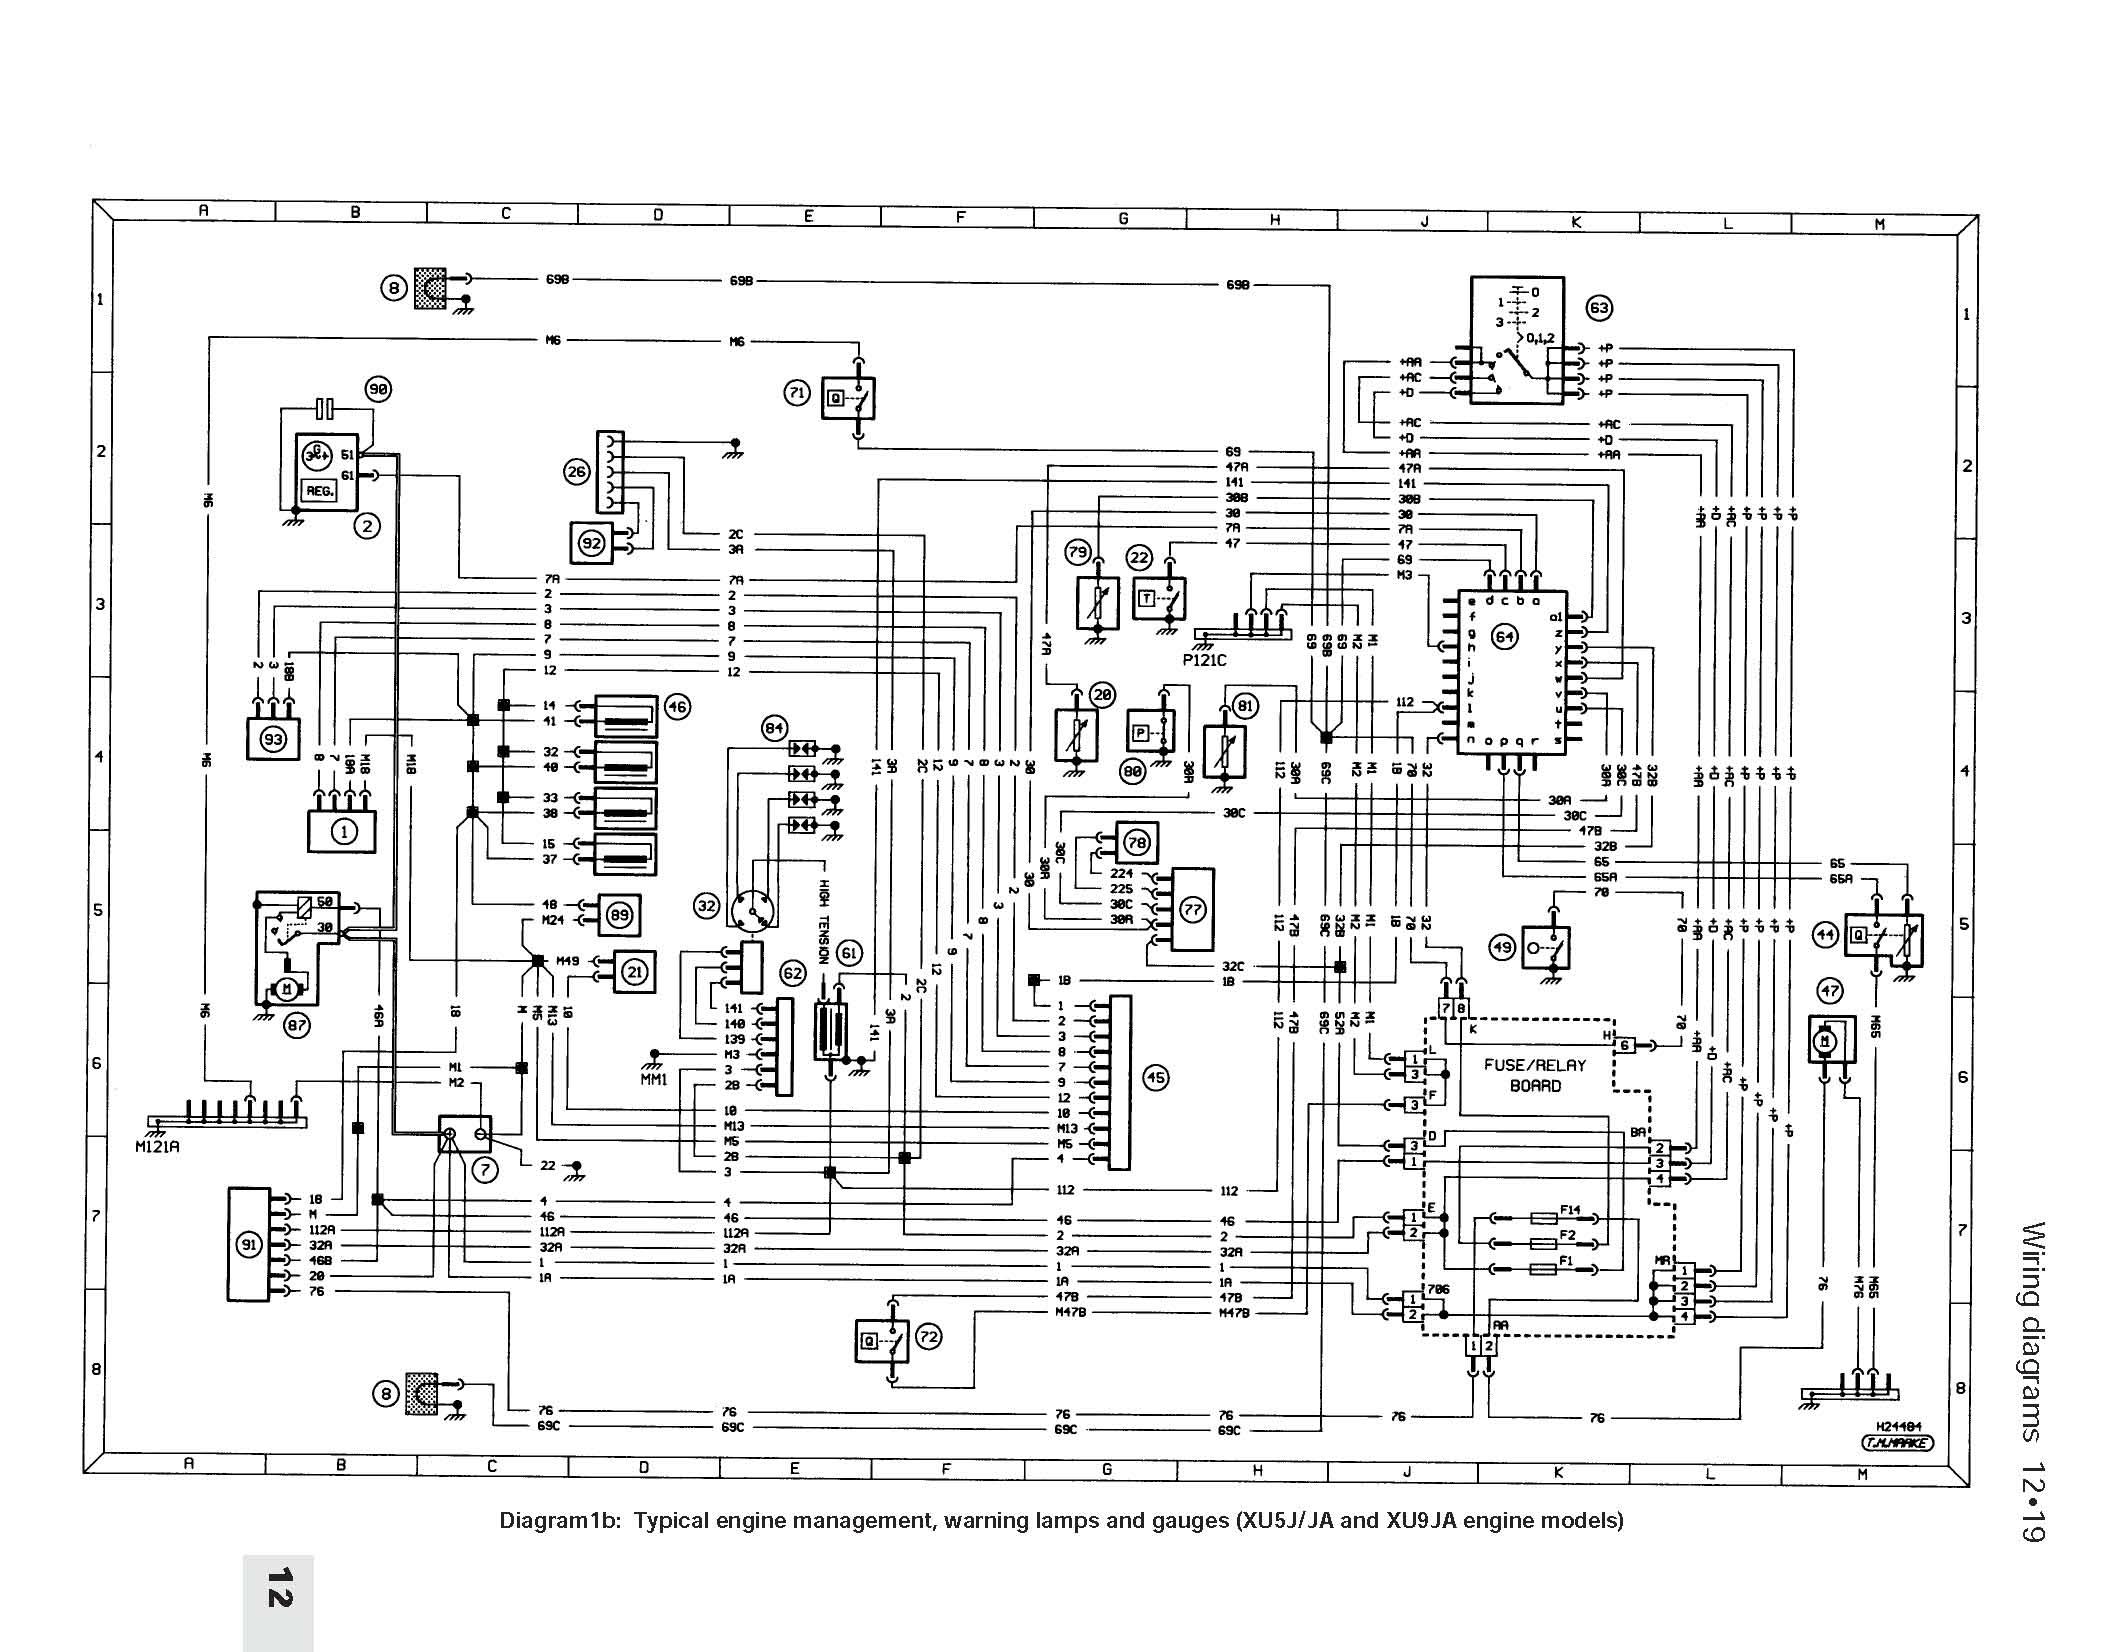 mga wiring diagram dolgular com schema_elec_xu9ja_xu5ja_page_19 mga wiring  diagram dolgular com mga wiring diagram 1962 at